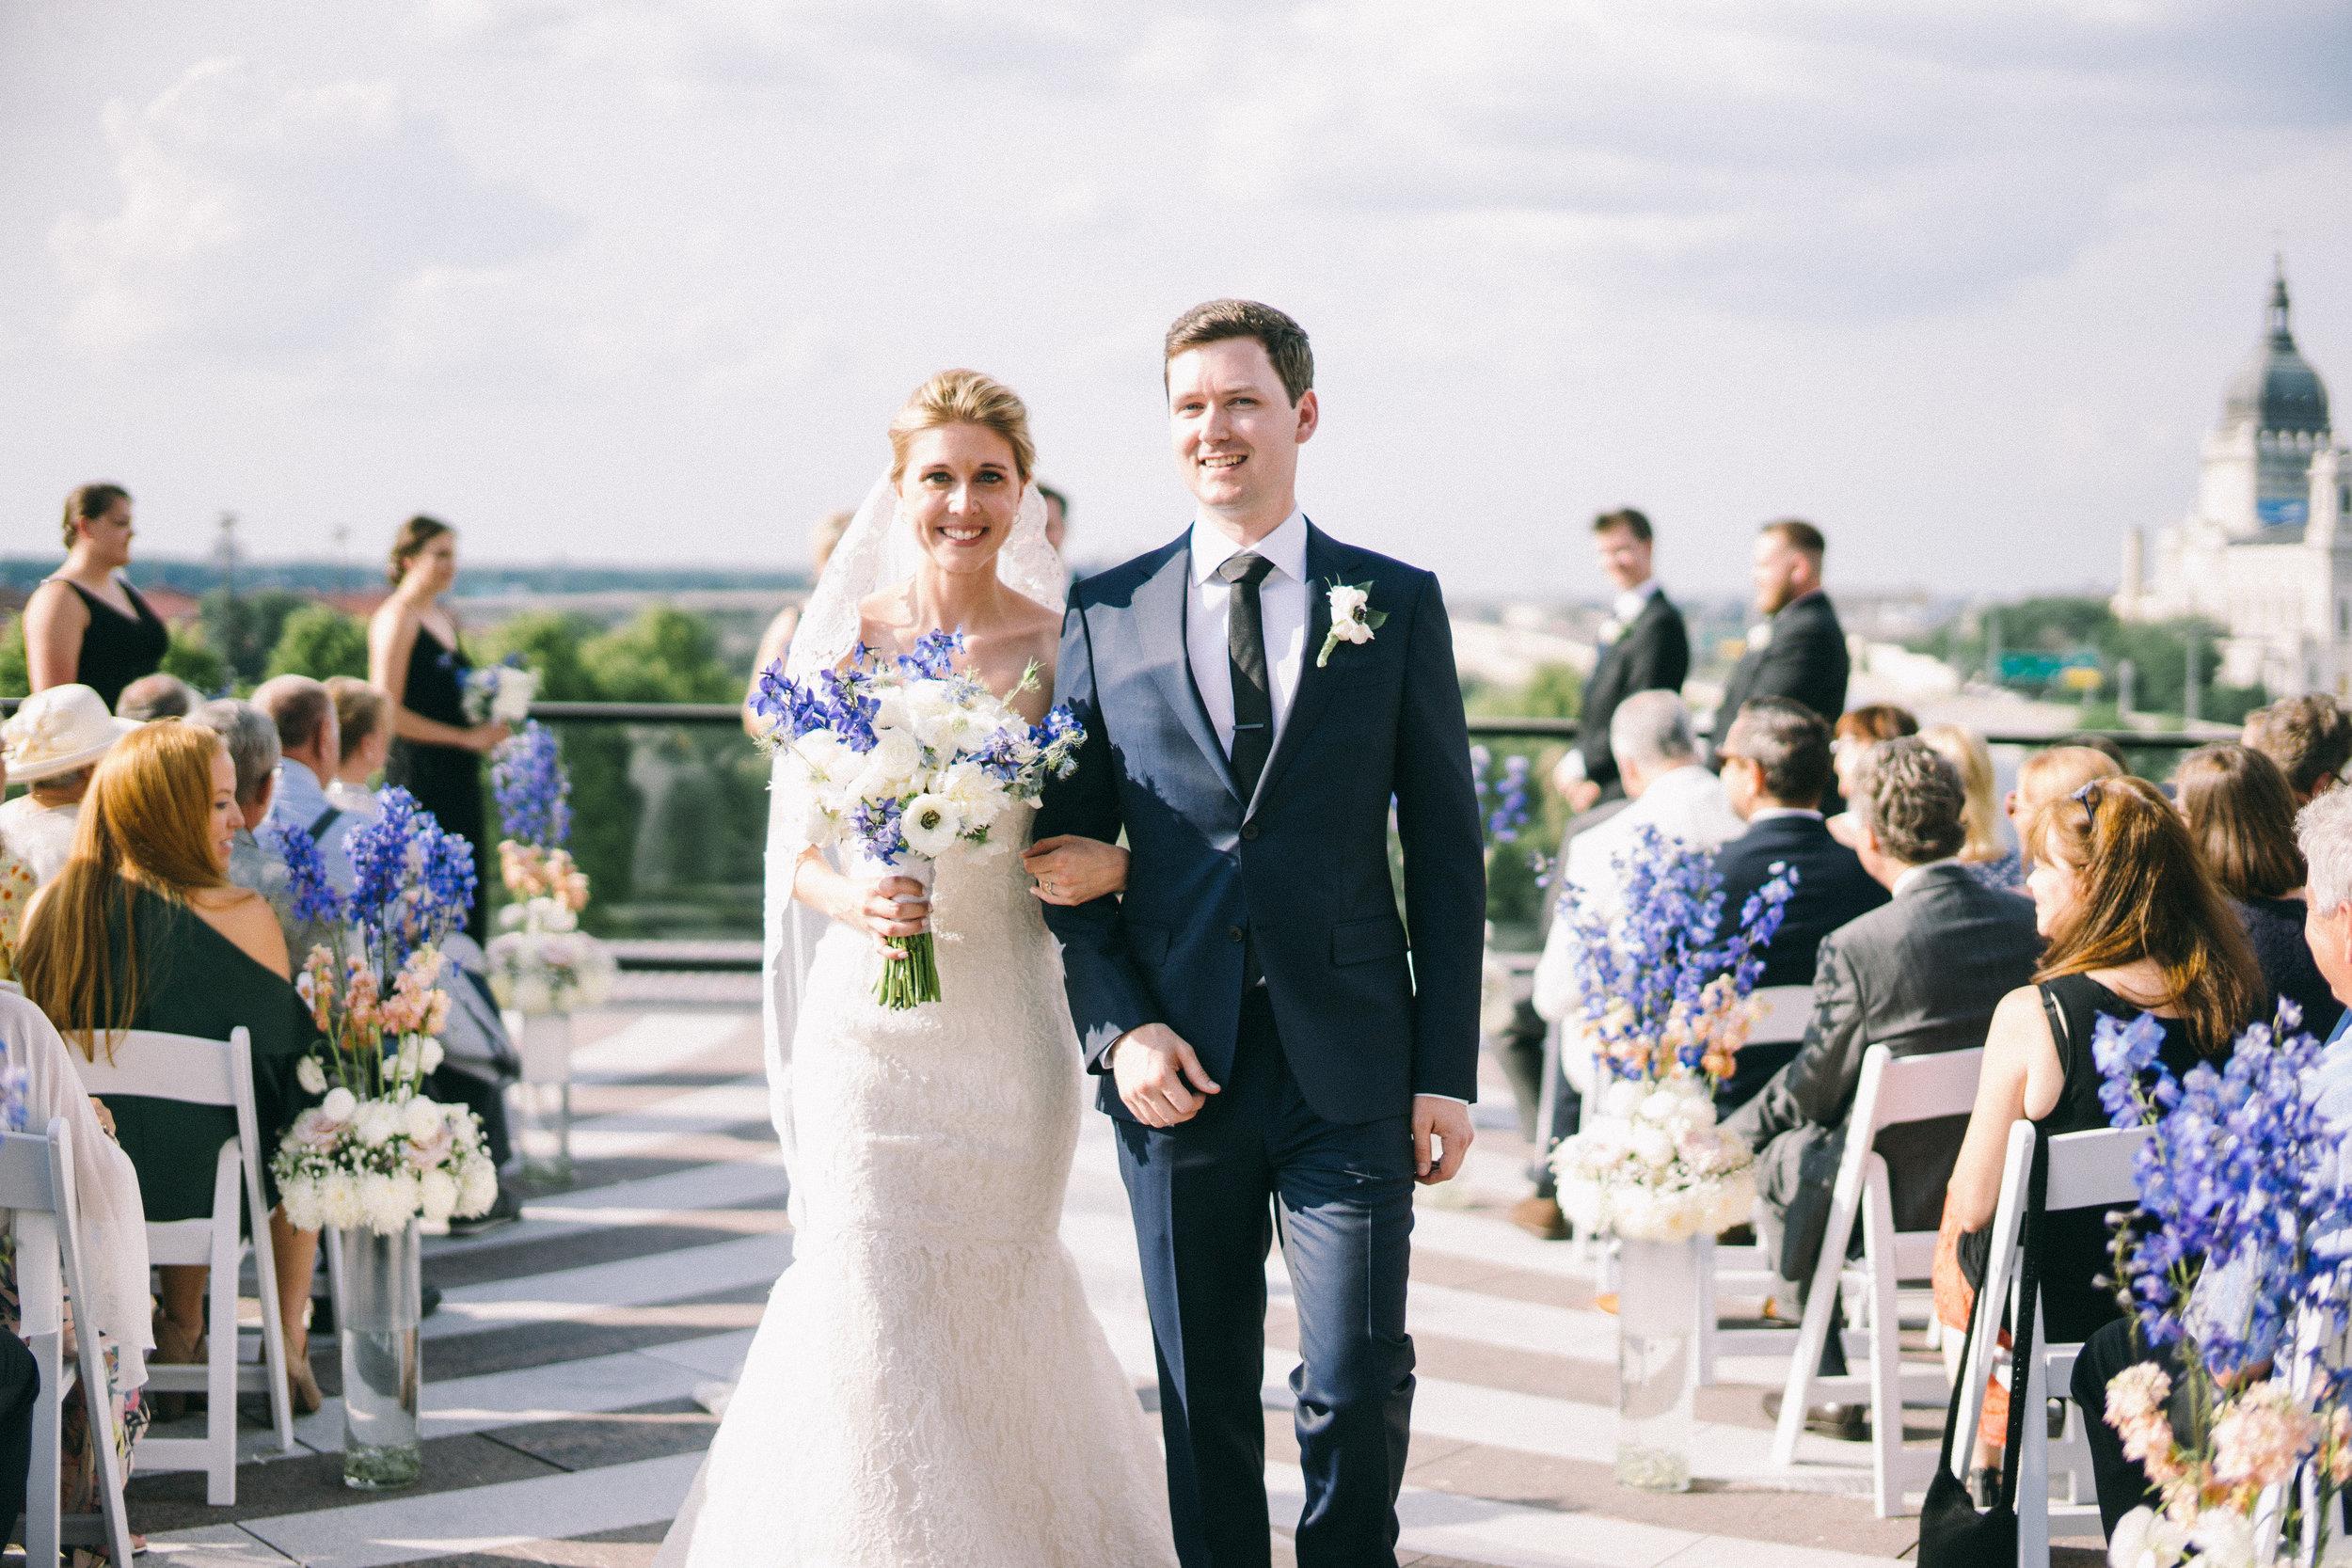 Sam + Lane | Laine Palm Designs Wedding Planning